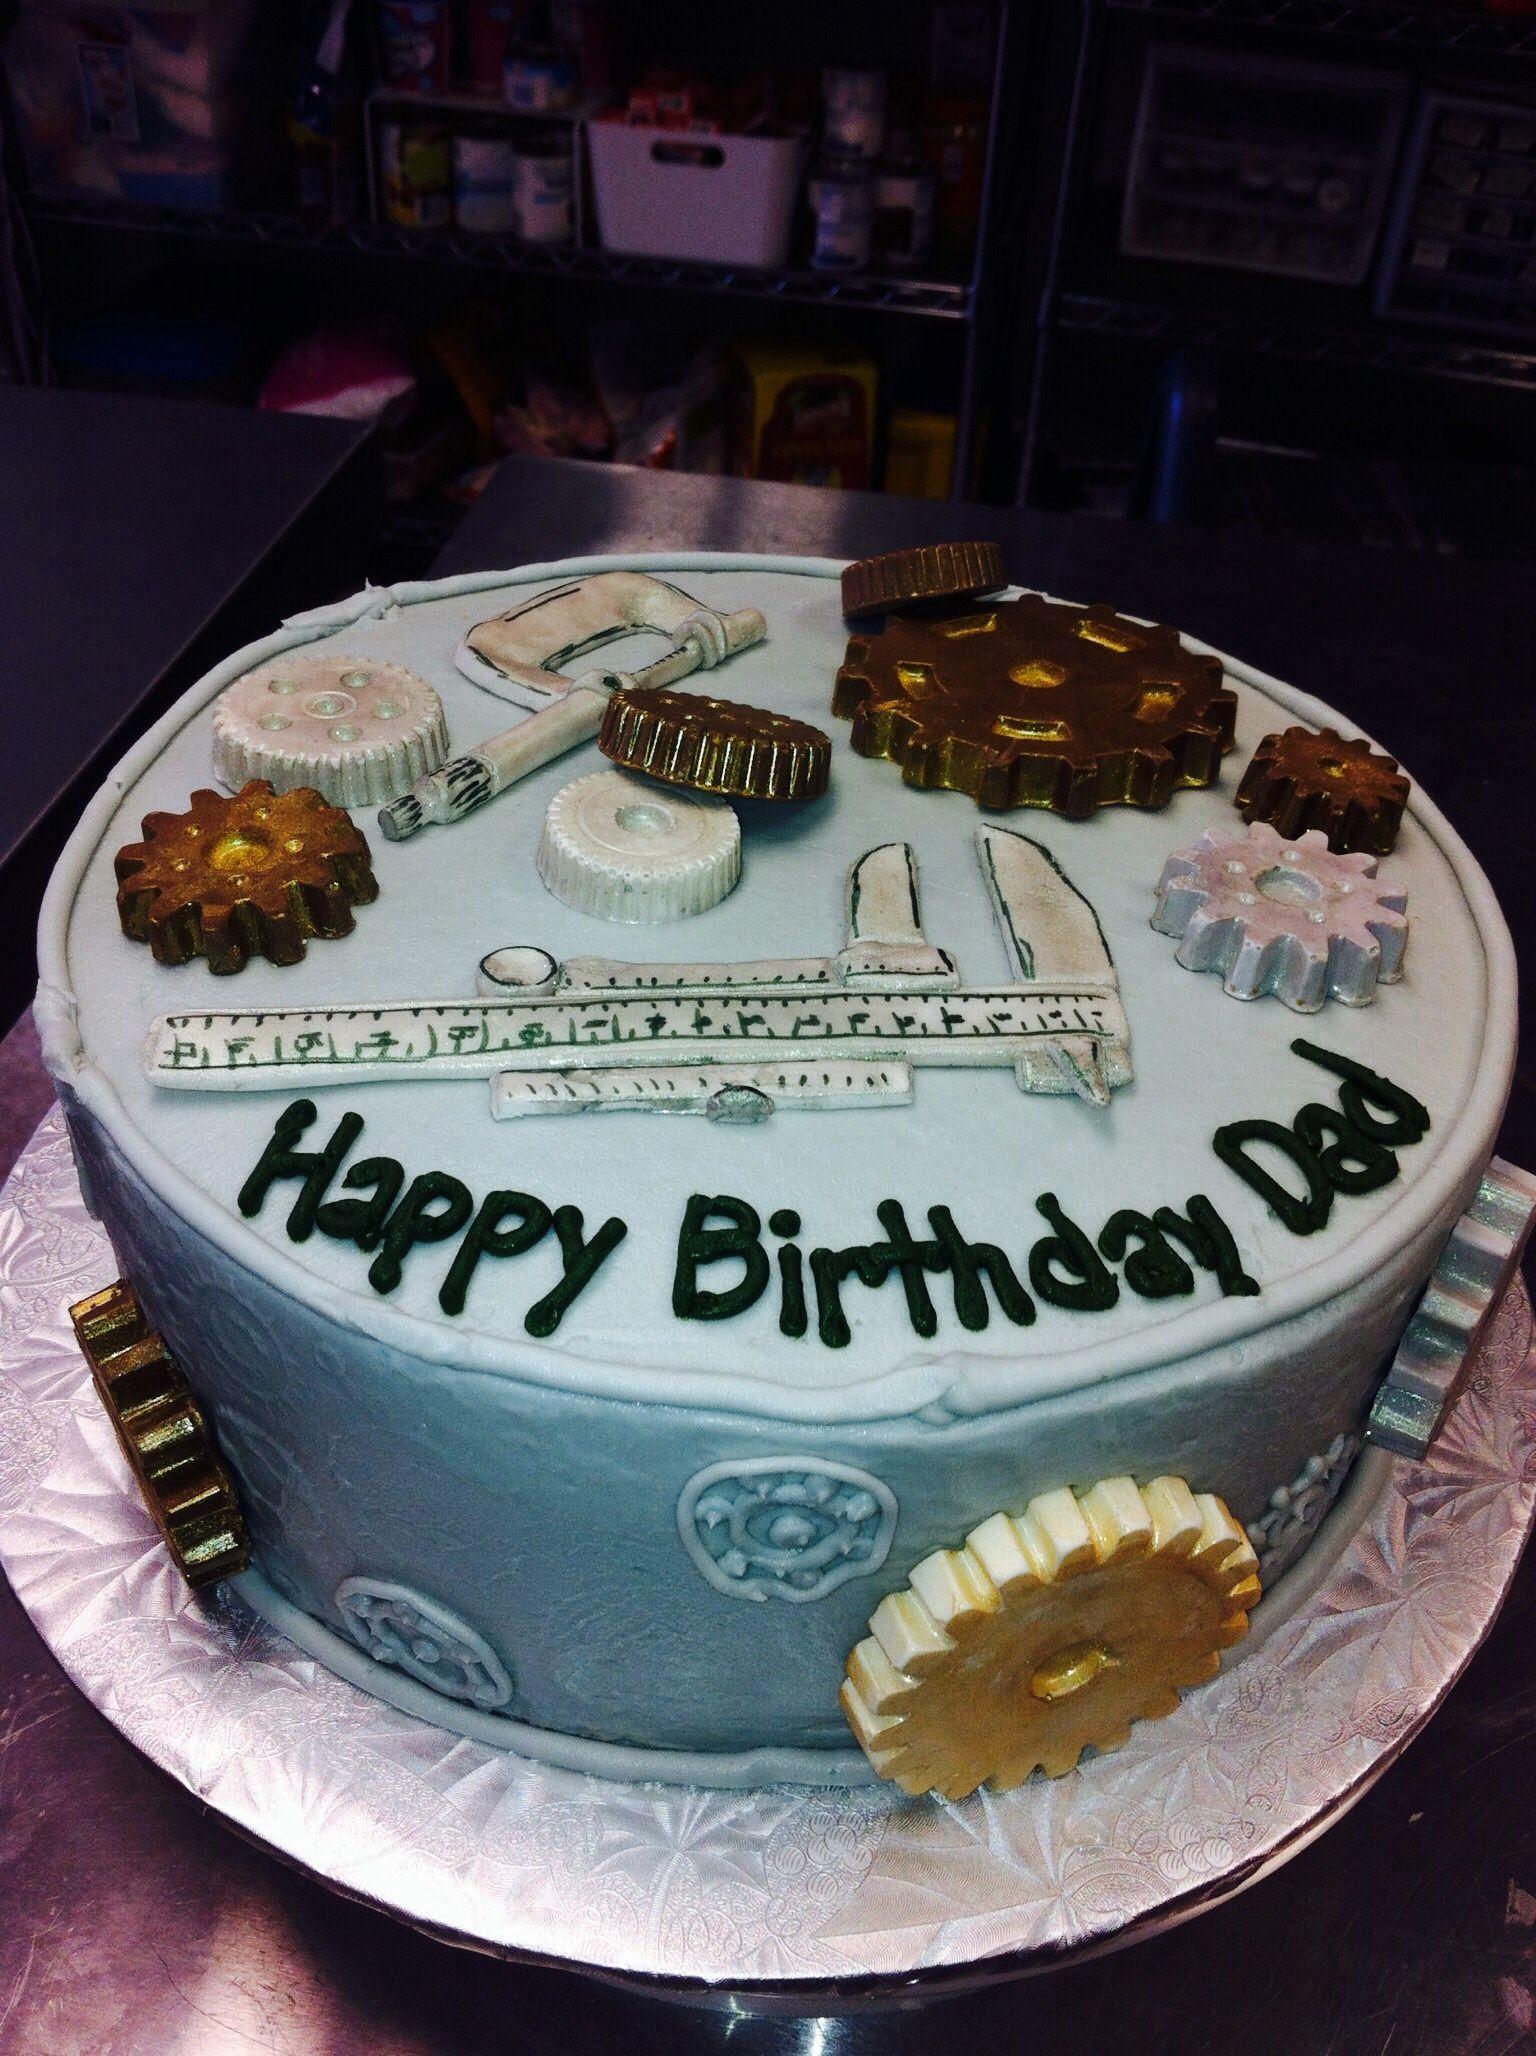 EngineeringMechanics Cake Custom Cakes Pinterest Cake